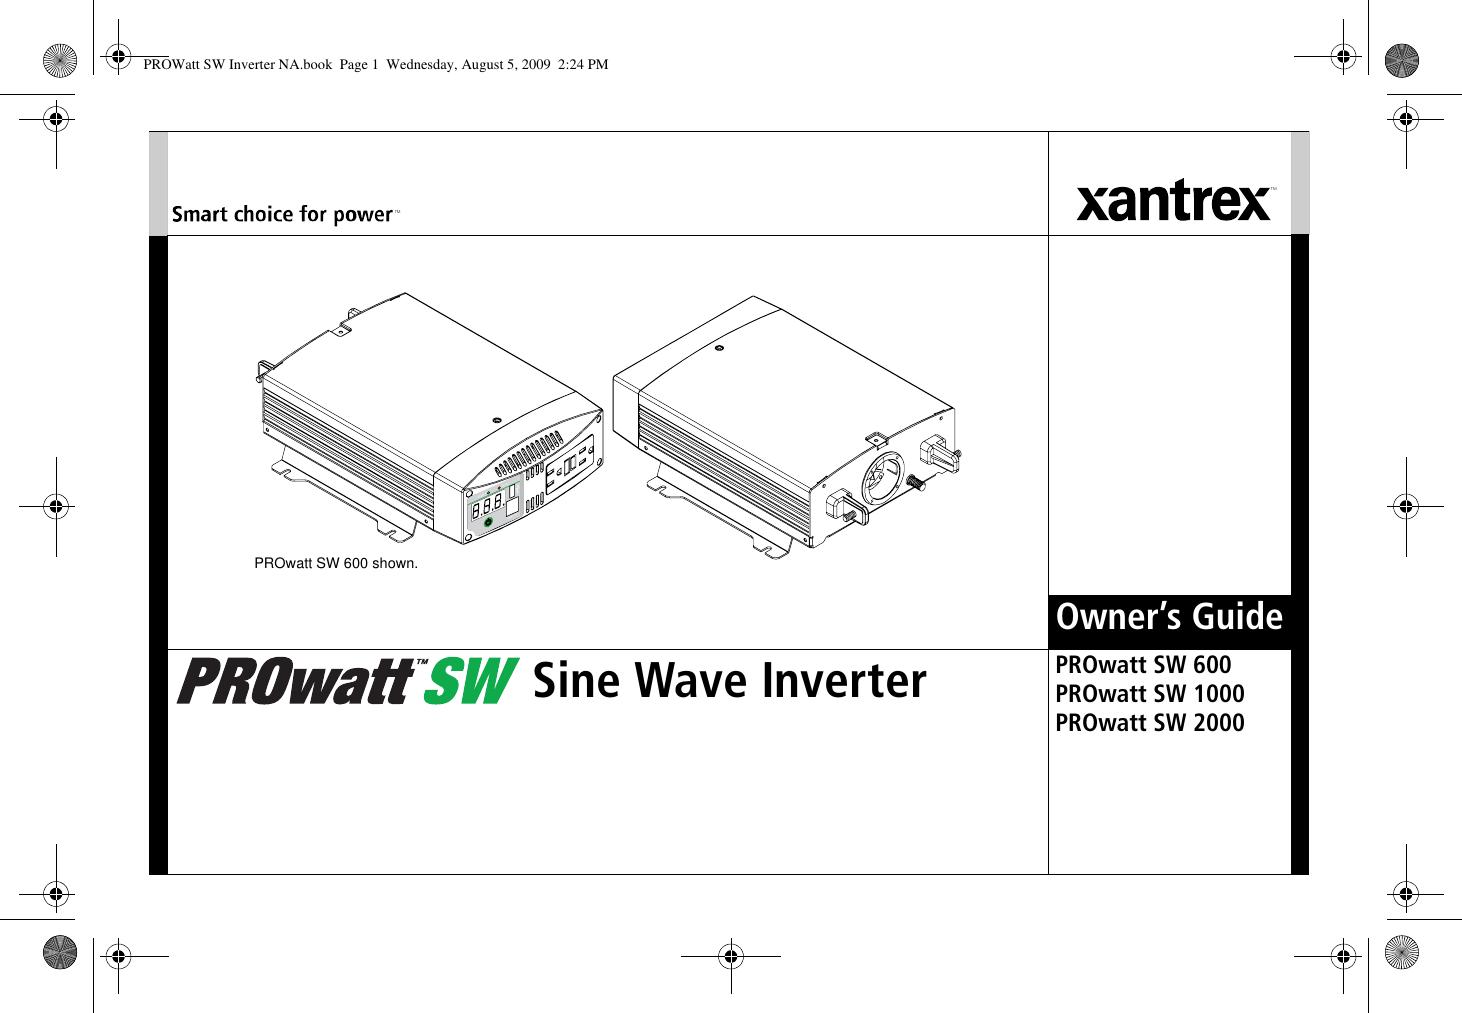 Xantrex Prowatt Sw 1000 Users Manual Inverter NA on whistler 2000 watt inverter, magnum 2000 watt inverter, combi 2000 watt inverter, freedom jazz 500 watt inverter, xantrex inverter charger 2000, aims 2000 watt power inverter, go power 2000 watt inverter,